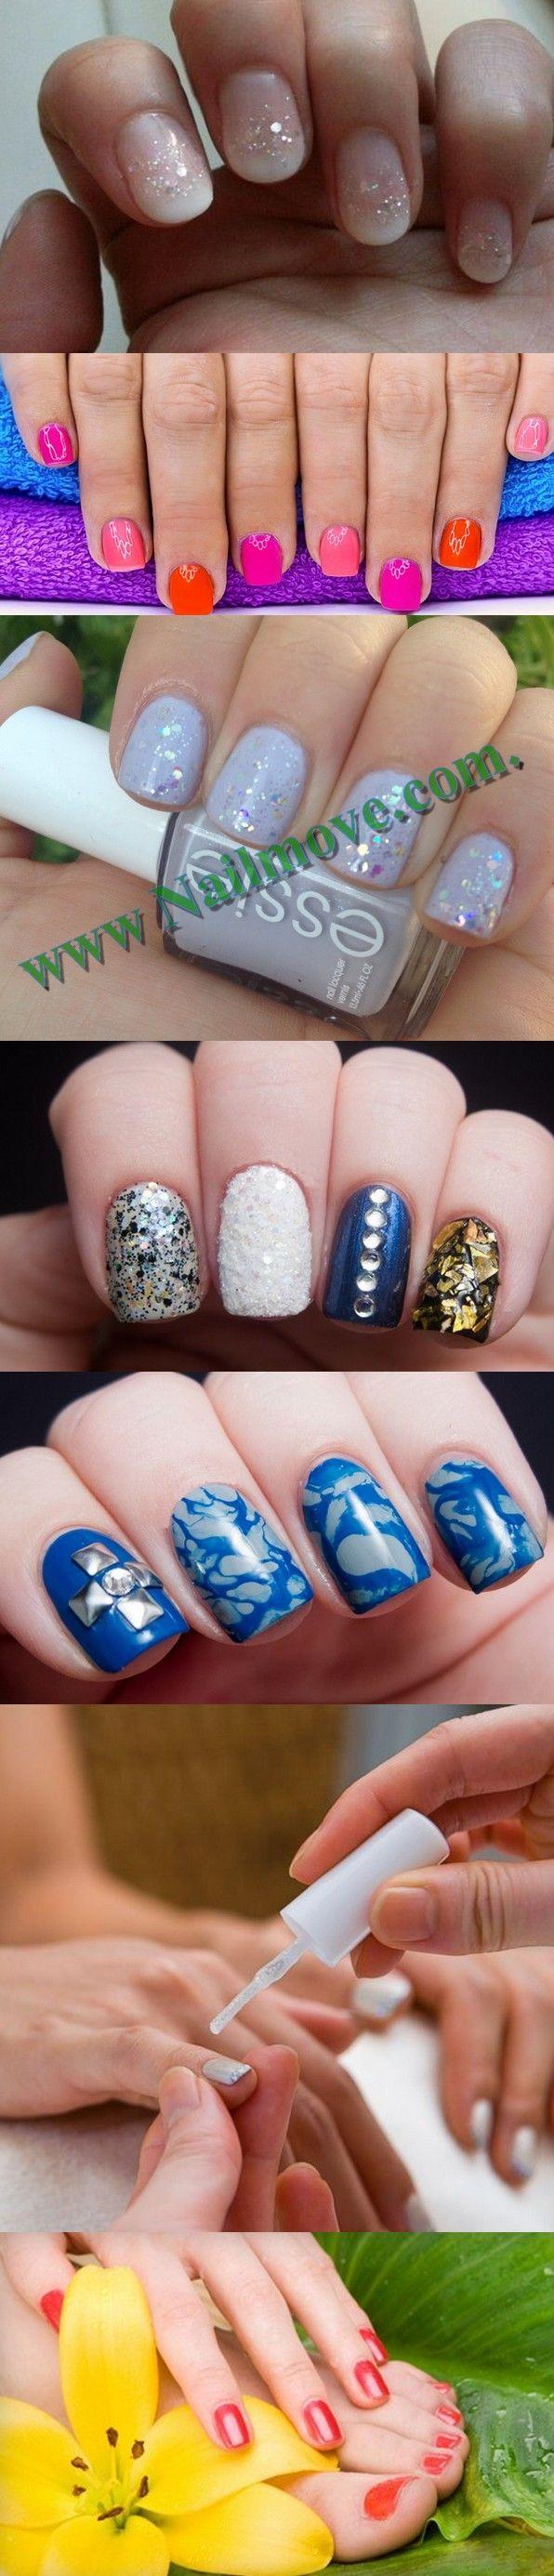 Colour club nail polish review, Essie nail polish review, Milani nail polish review, scotch nail polish reviews, Suncoat nail polish review, Rubi nail polish review,